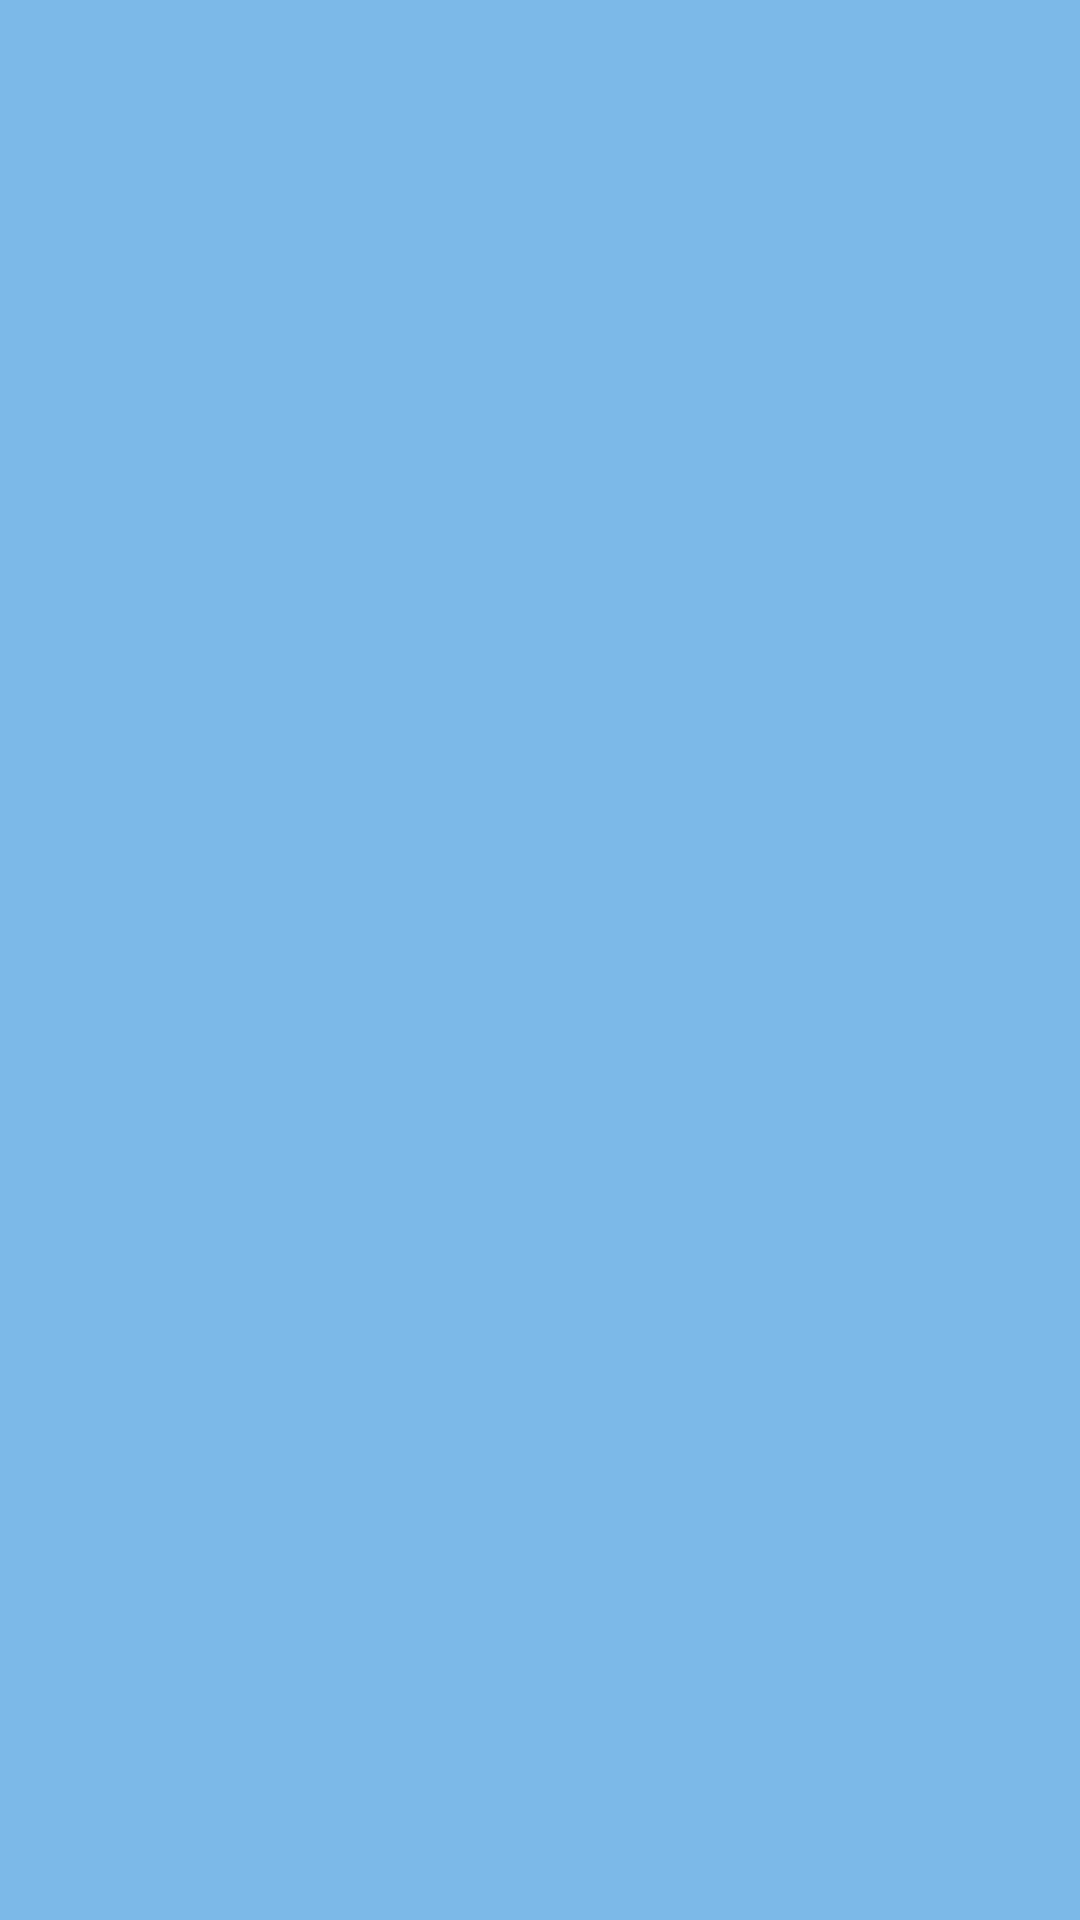 1080x1920 Aero Solid Color Background